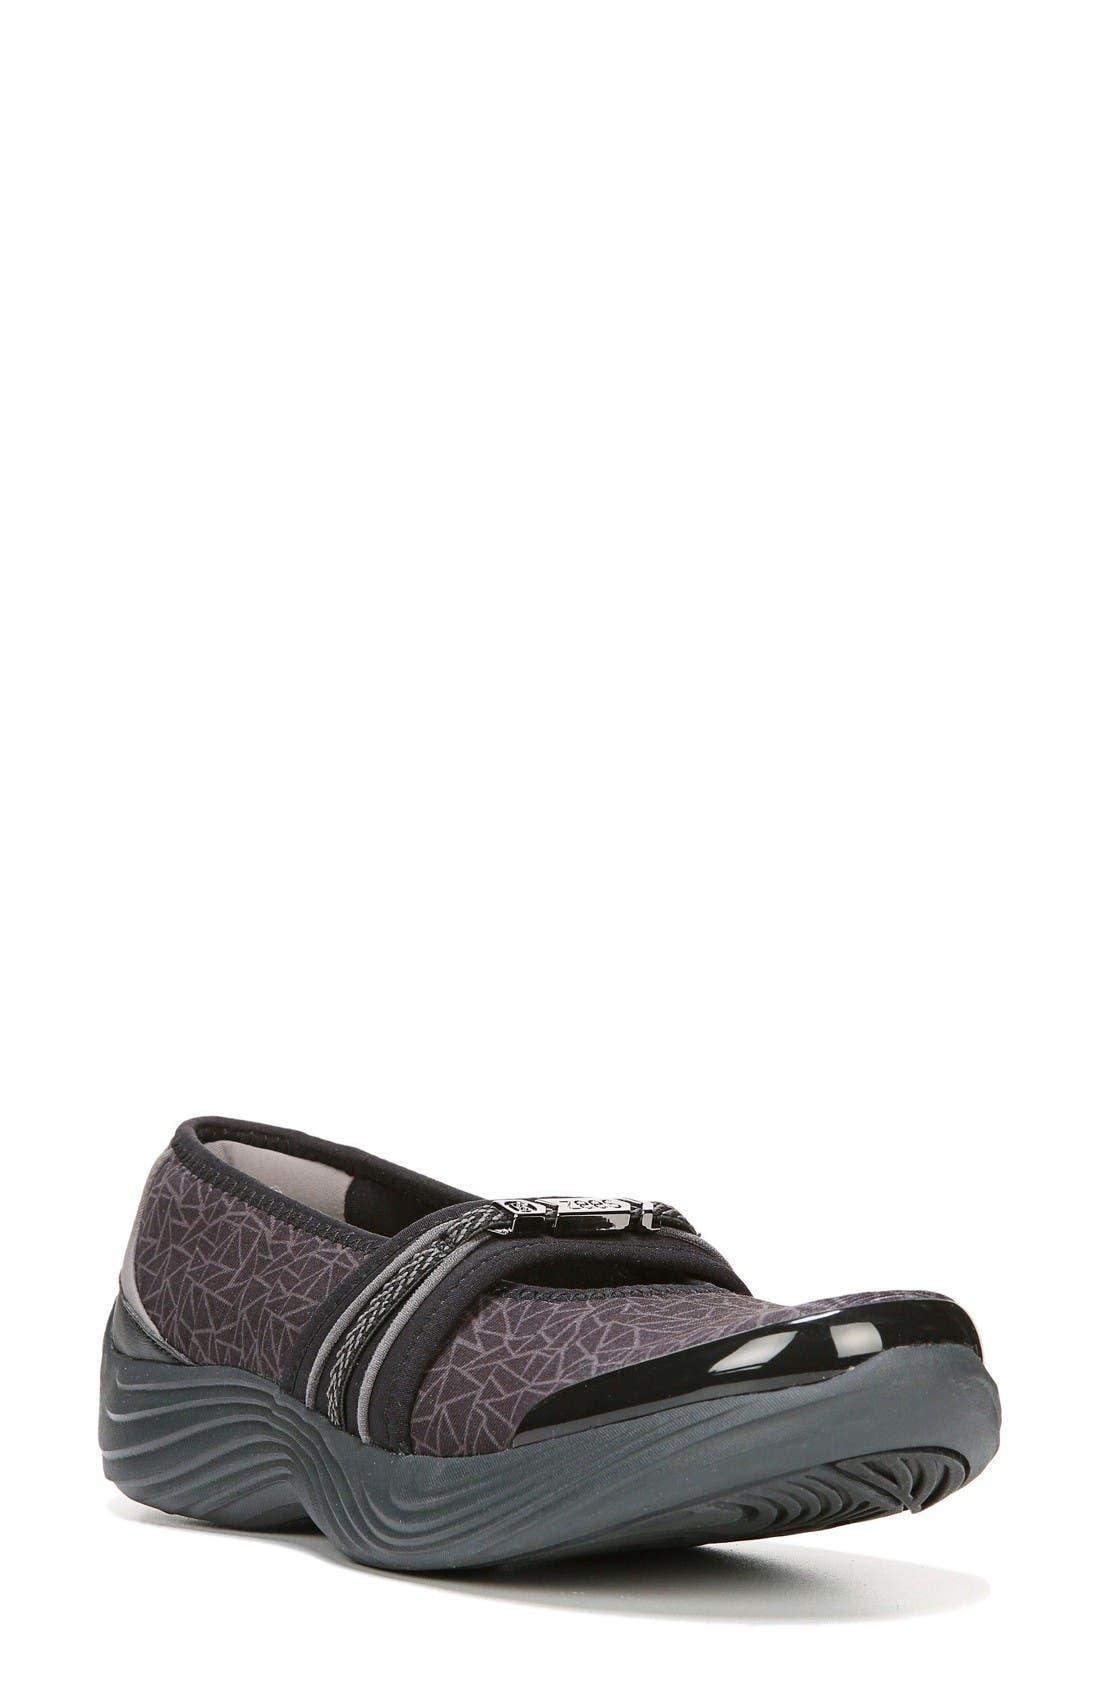 Alternate Image 1 Selected - BZees Twinkle Slip-On Sneaker (Women)